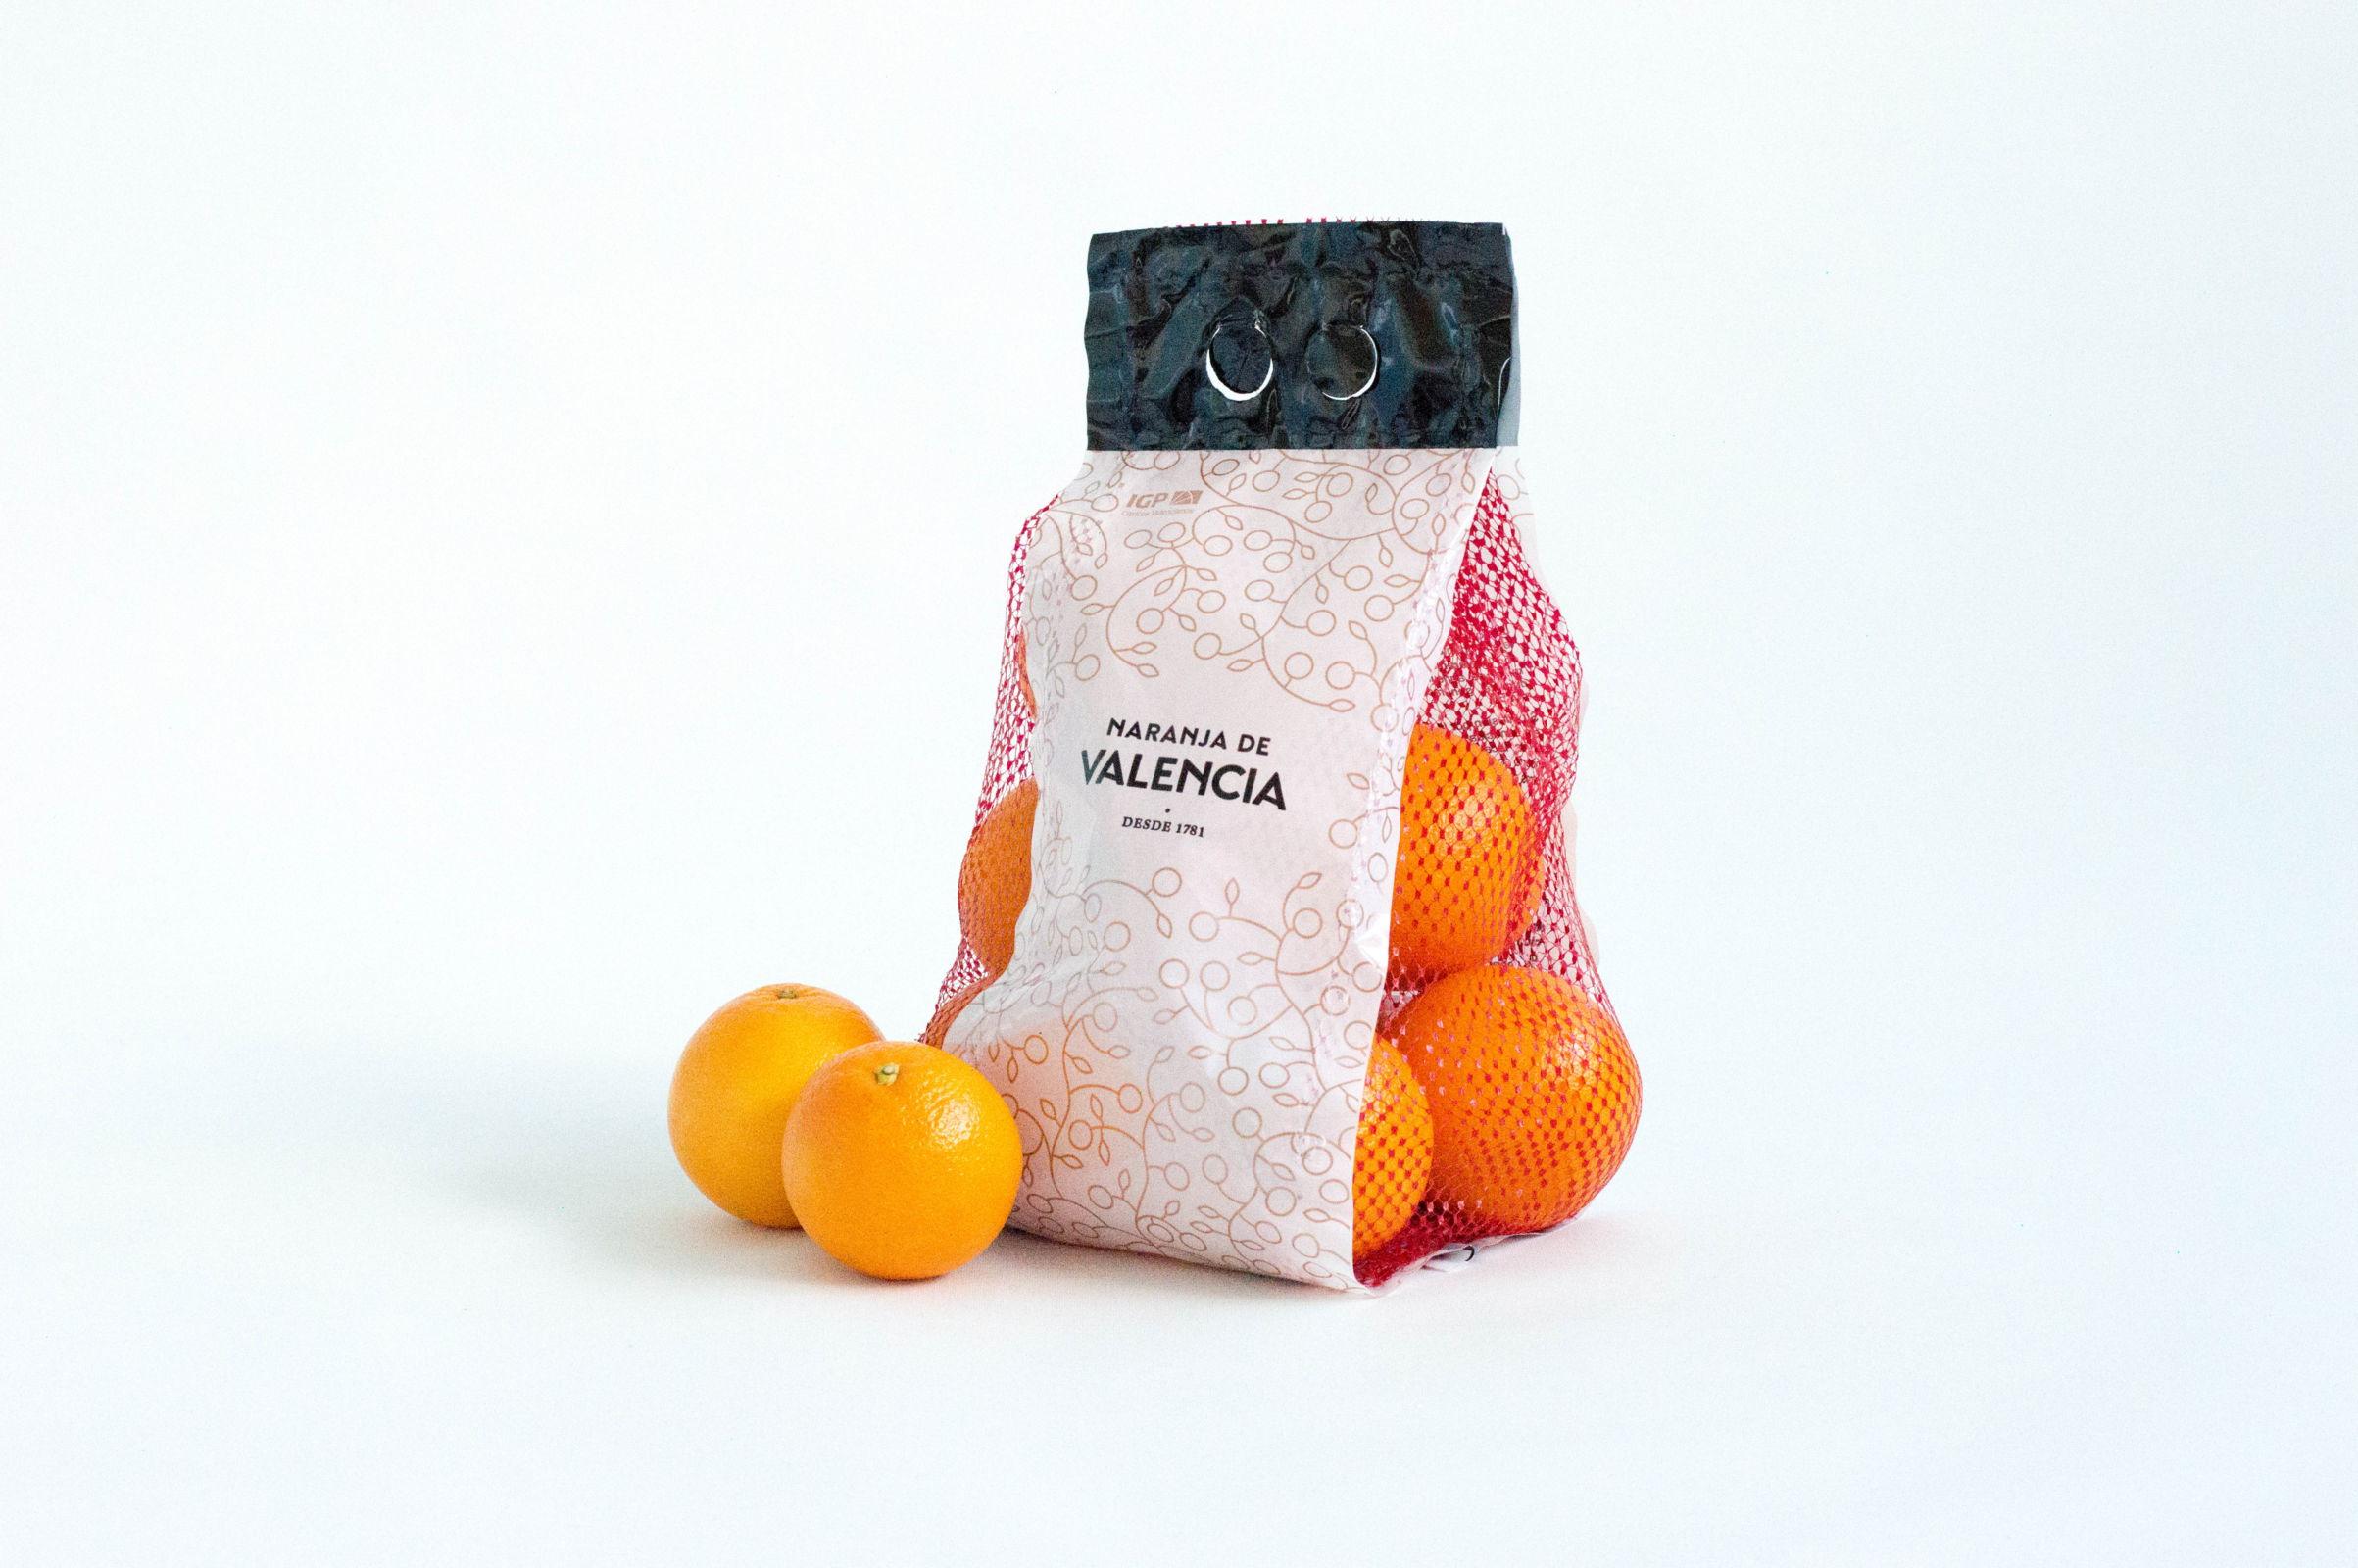 naranjadevalencia-postre-2kg-malla